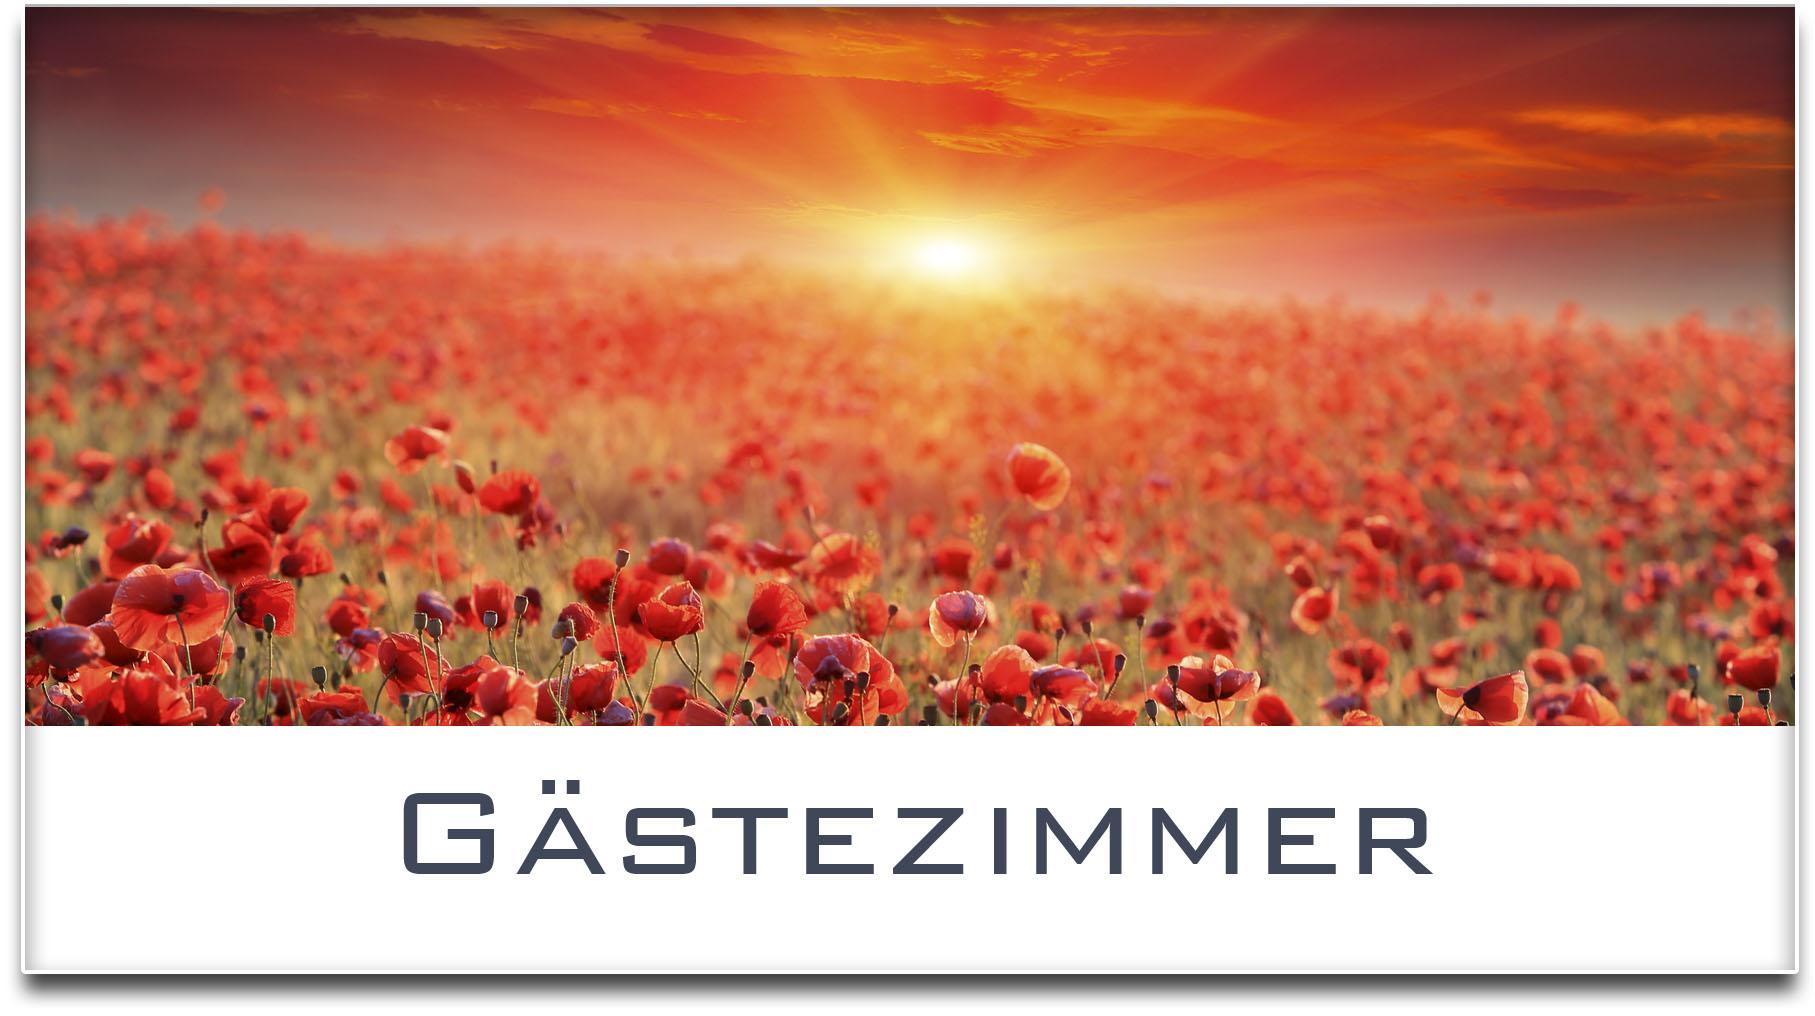 Türschild / Mohnfeld / Sonnenuntergang / Gästezimmer / Selbstklebend